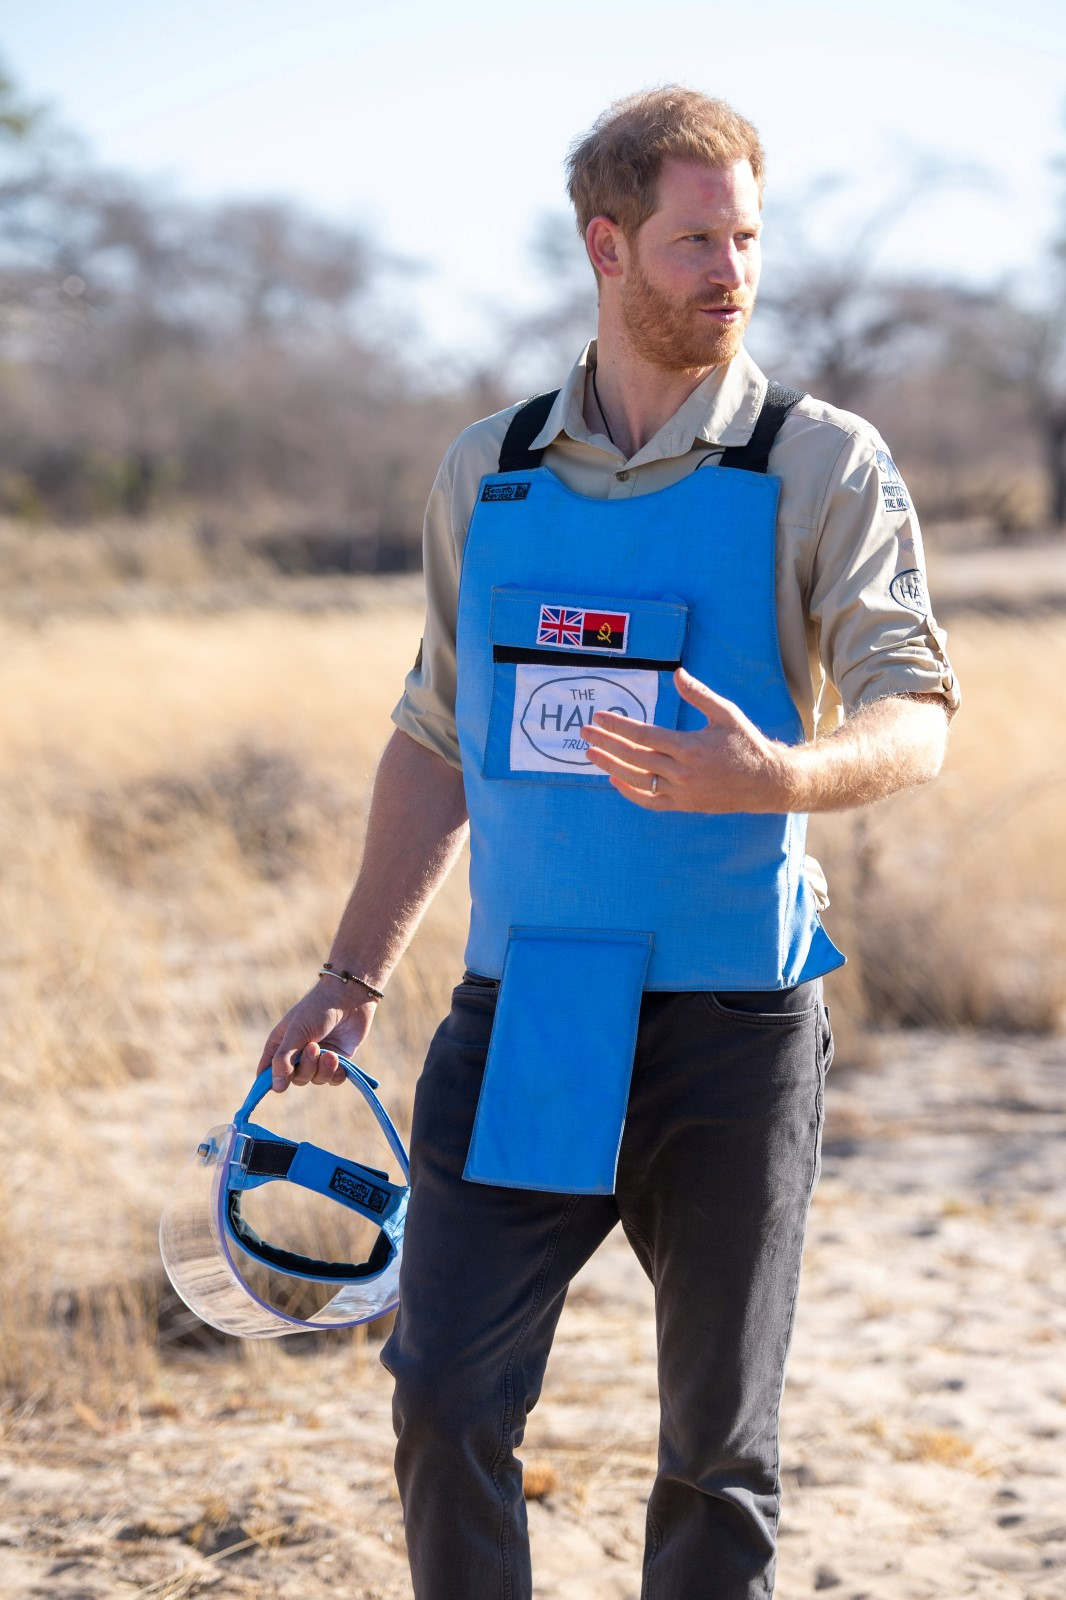 Princ Harry na minovém poli v Angole